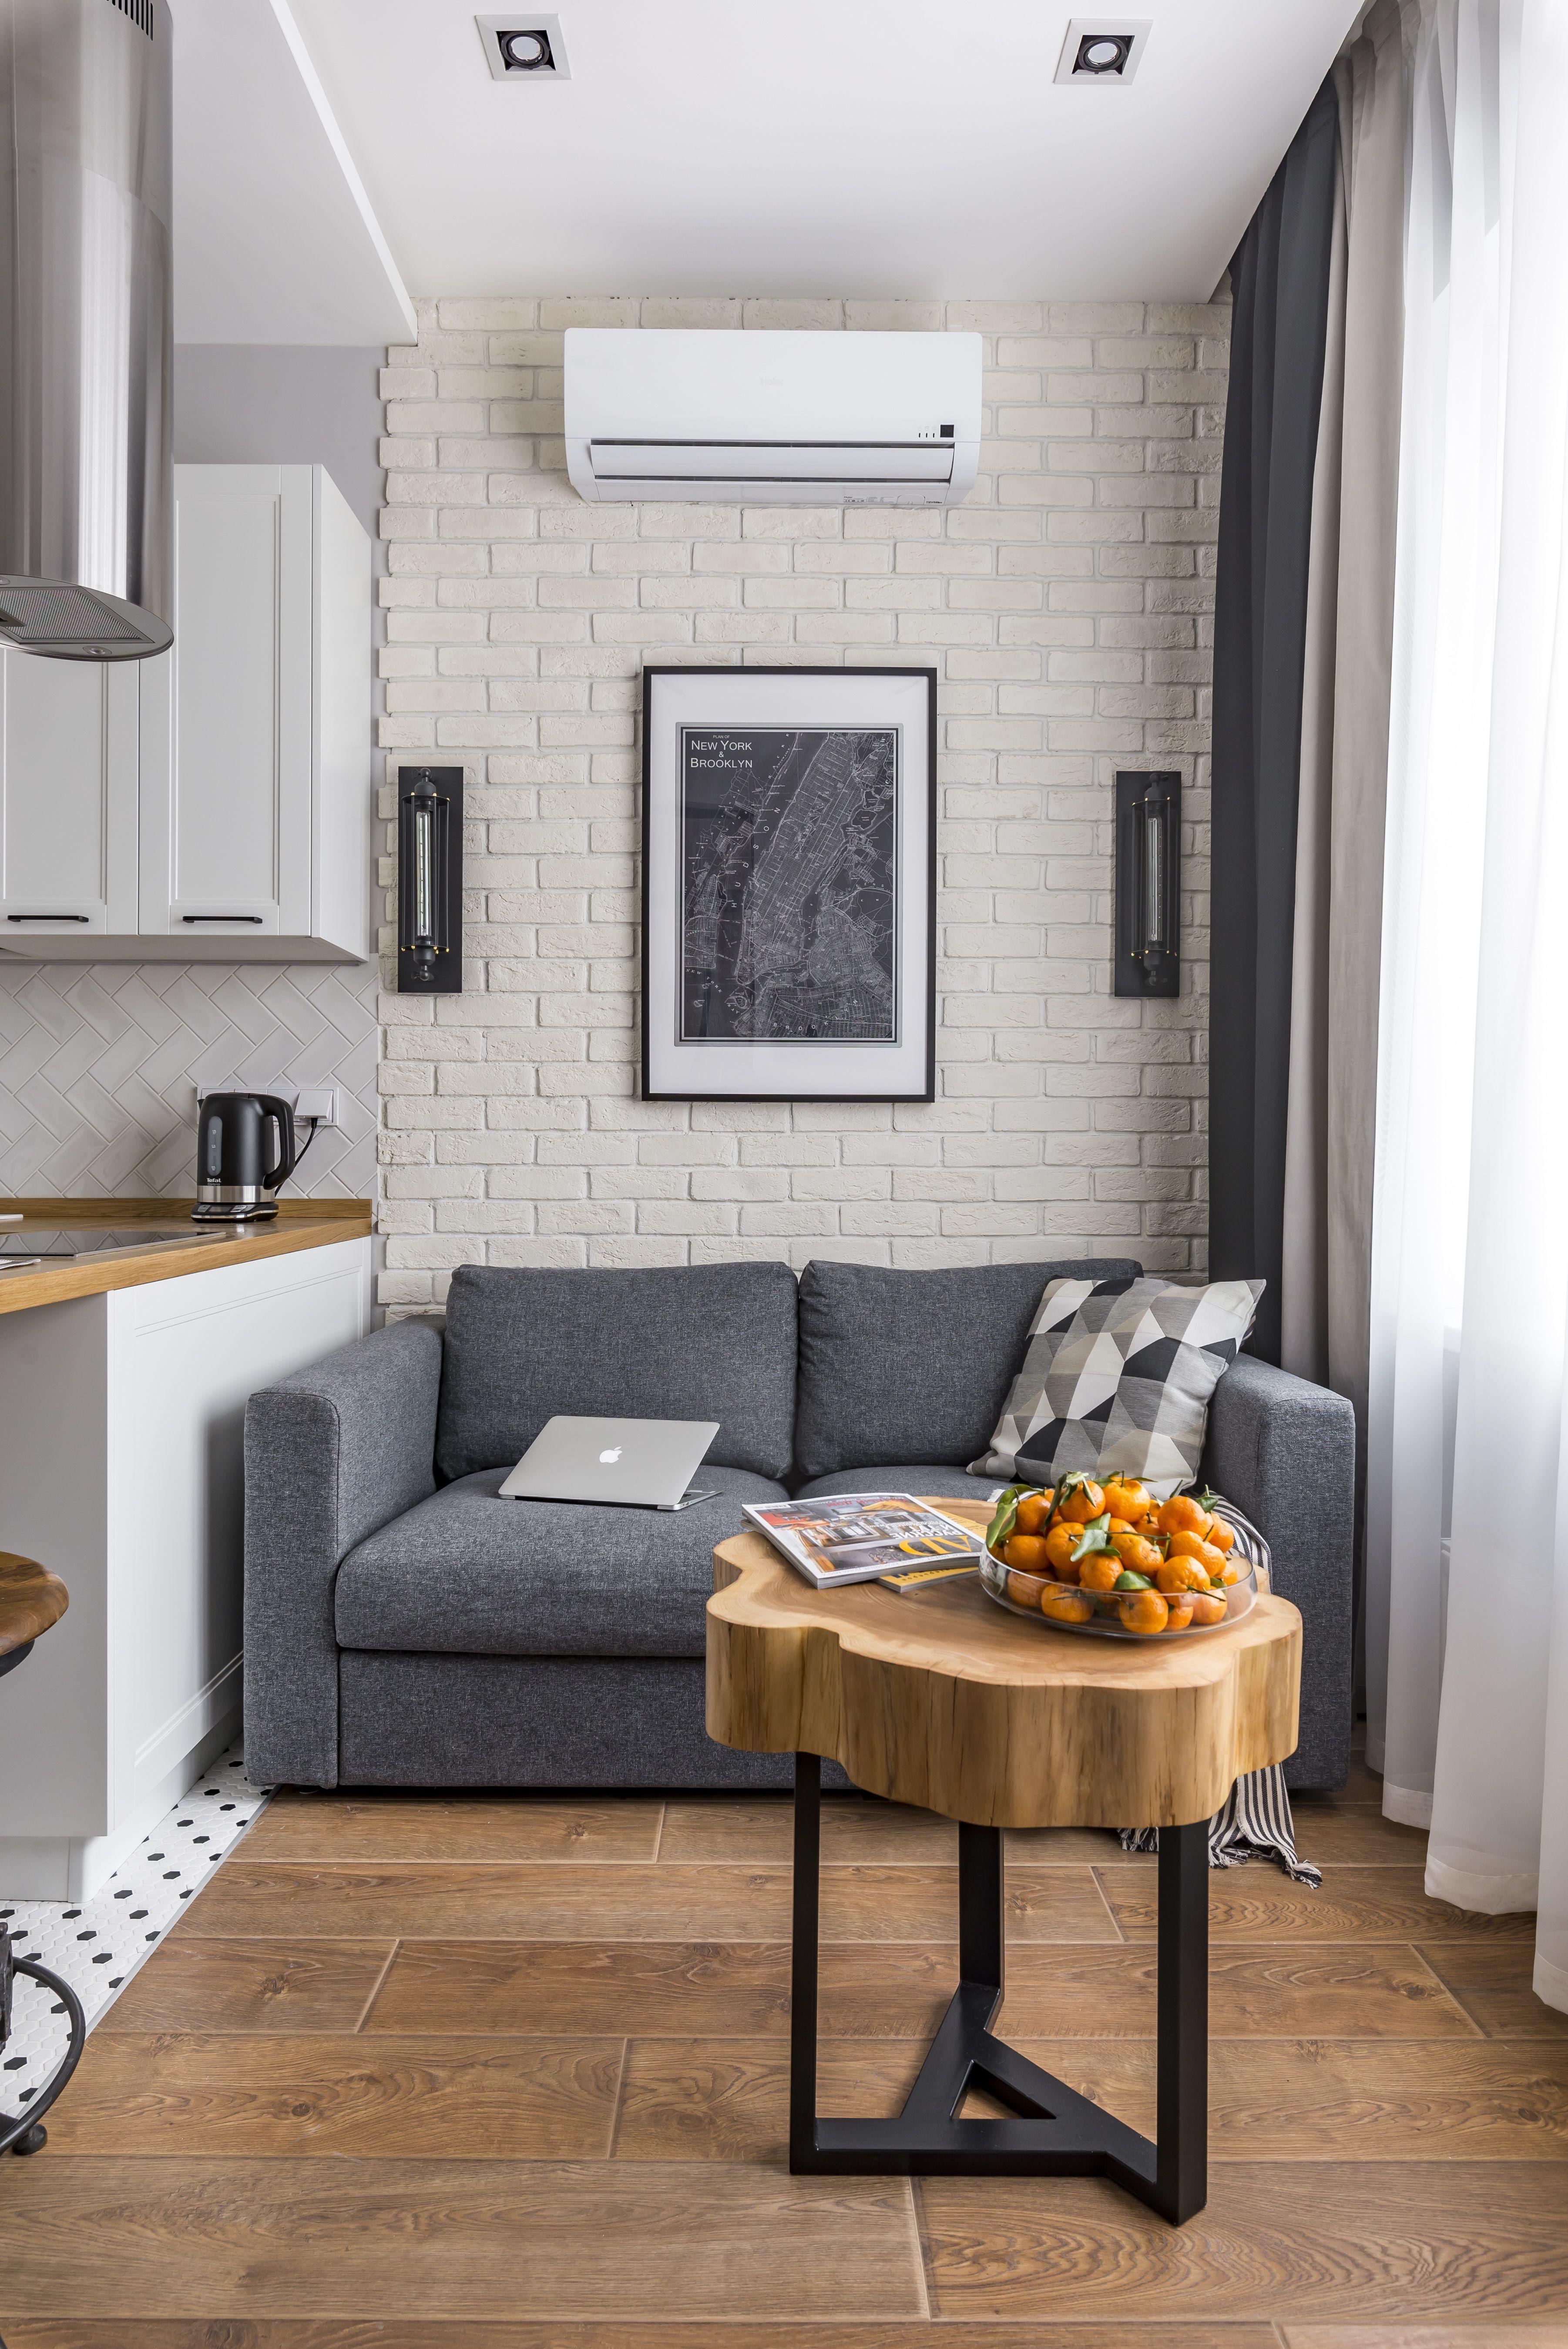 квартира студия маленькая квартира интерьер в стиле лофт